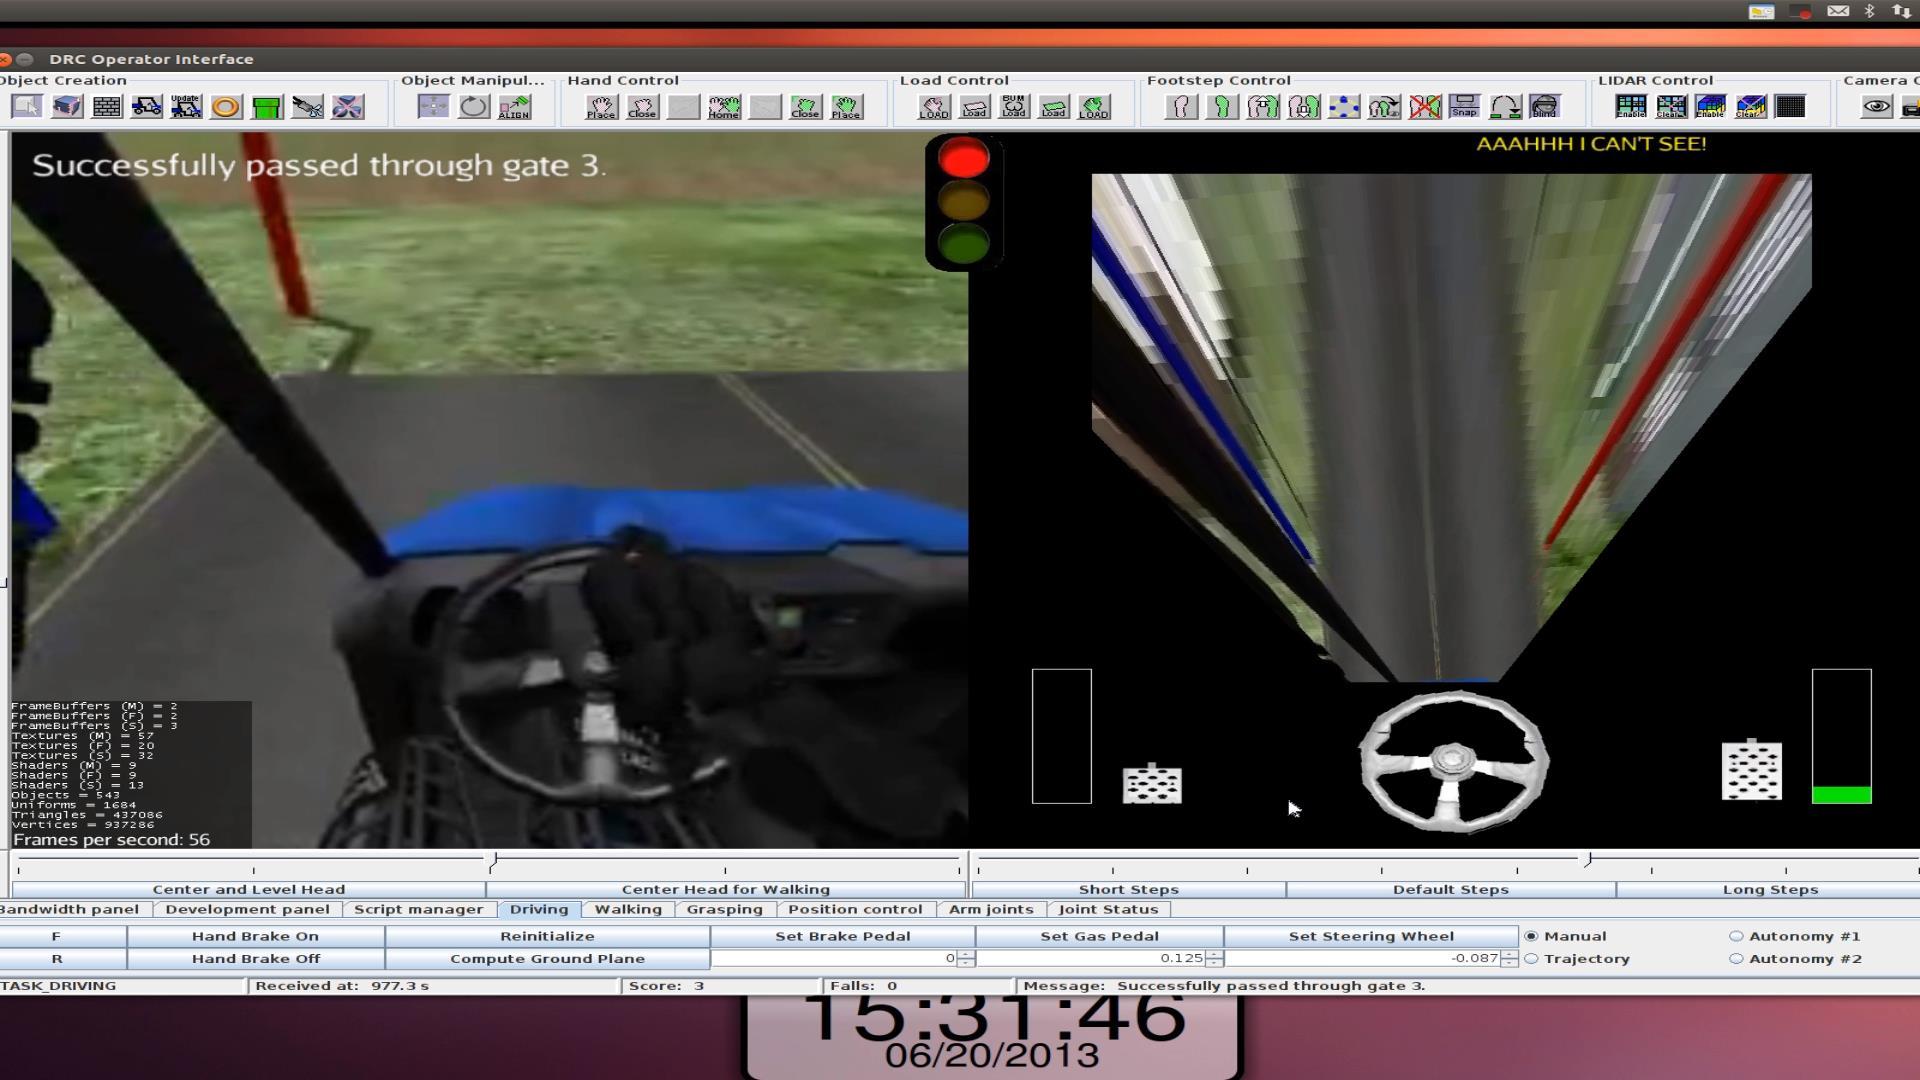 vrc_final_run14_driving (Subclip13).jpg